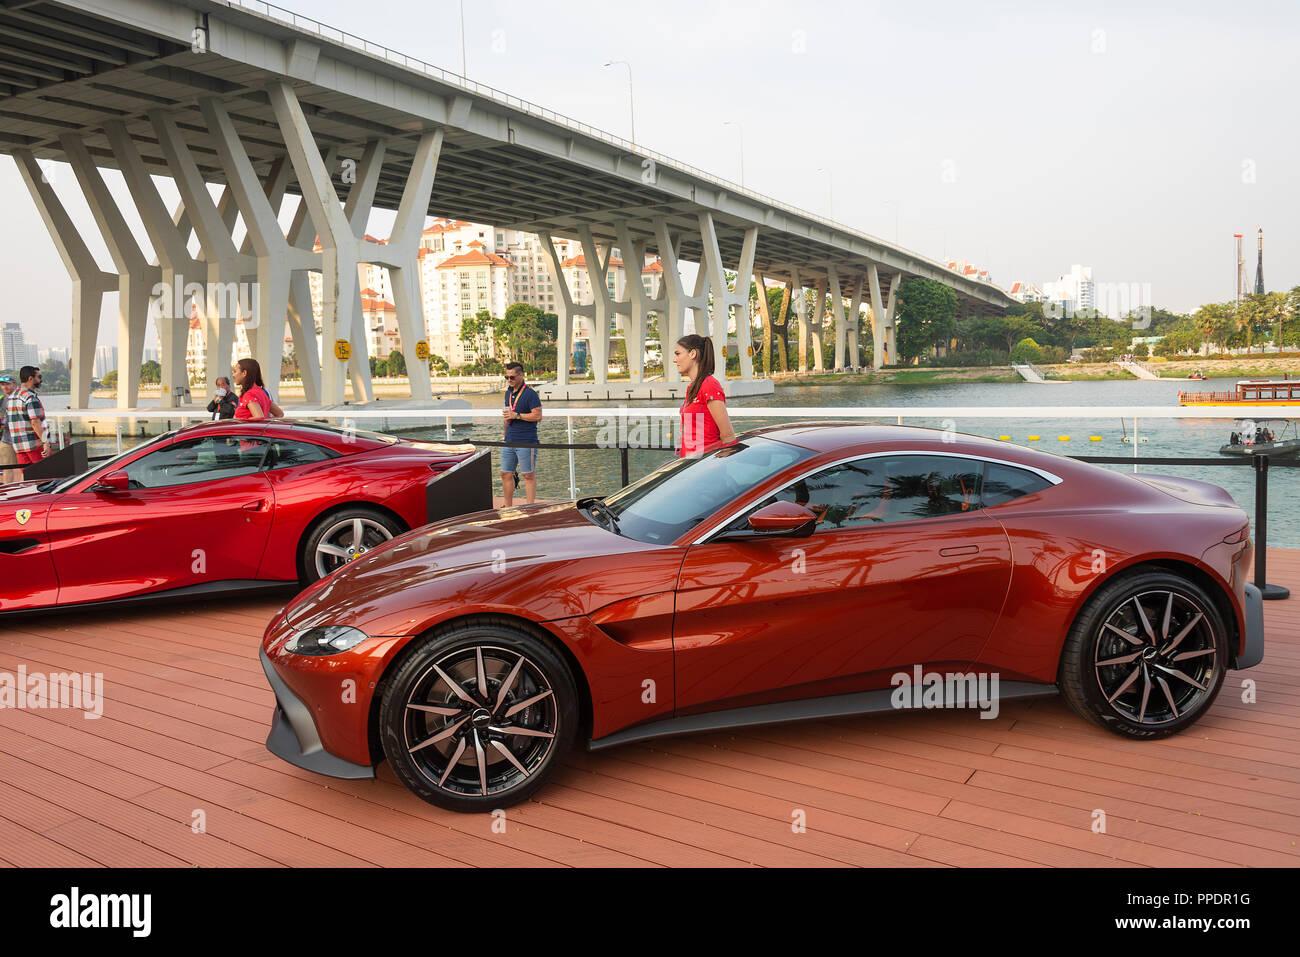 Ferrari Portofino And Aston Martin Vantage Luxury Cars On Display With Attractive Models At F1 Grand Prix At Marina Bay Singapore Asia Stock Photo Alamy